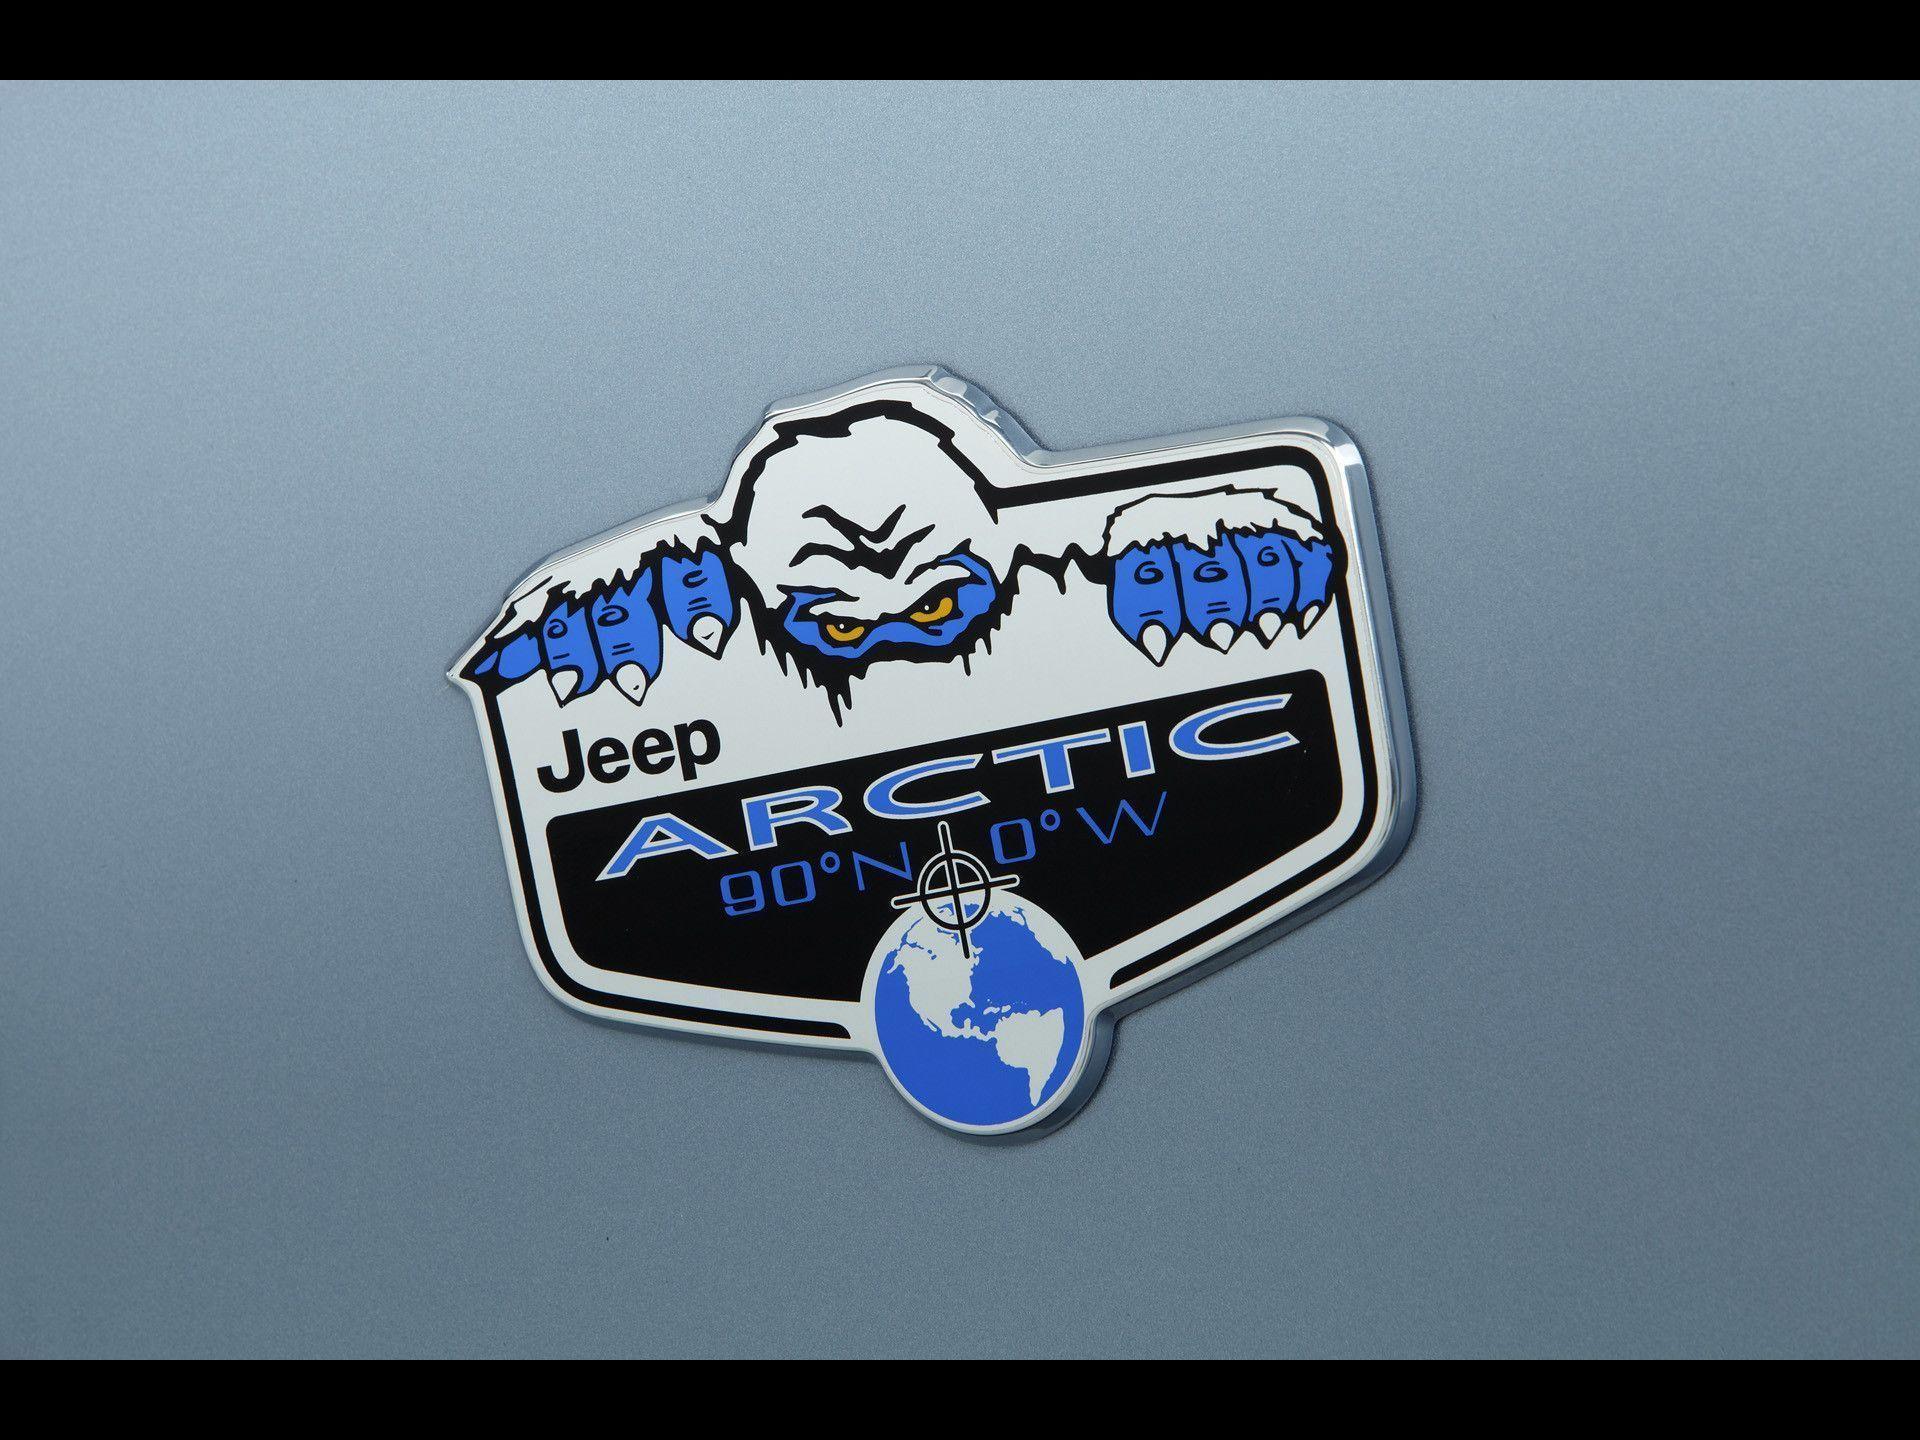 2012 Jeep Wrangler Arctic - Logo - 1920x1440 - Wallpaper